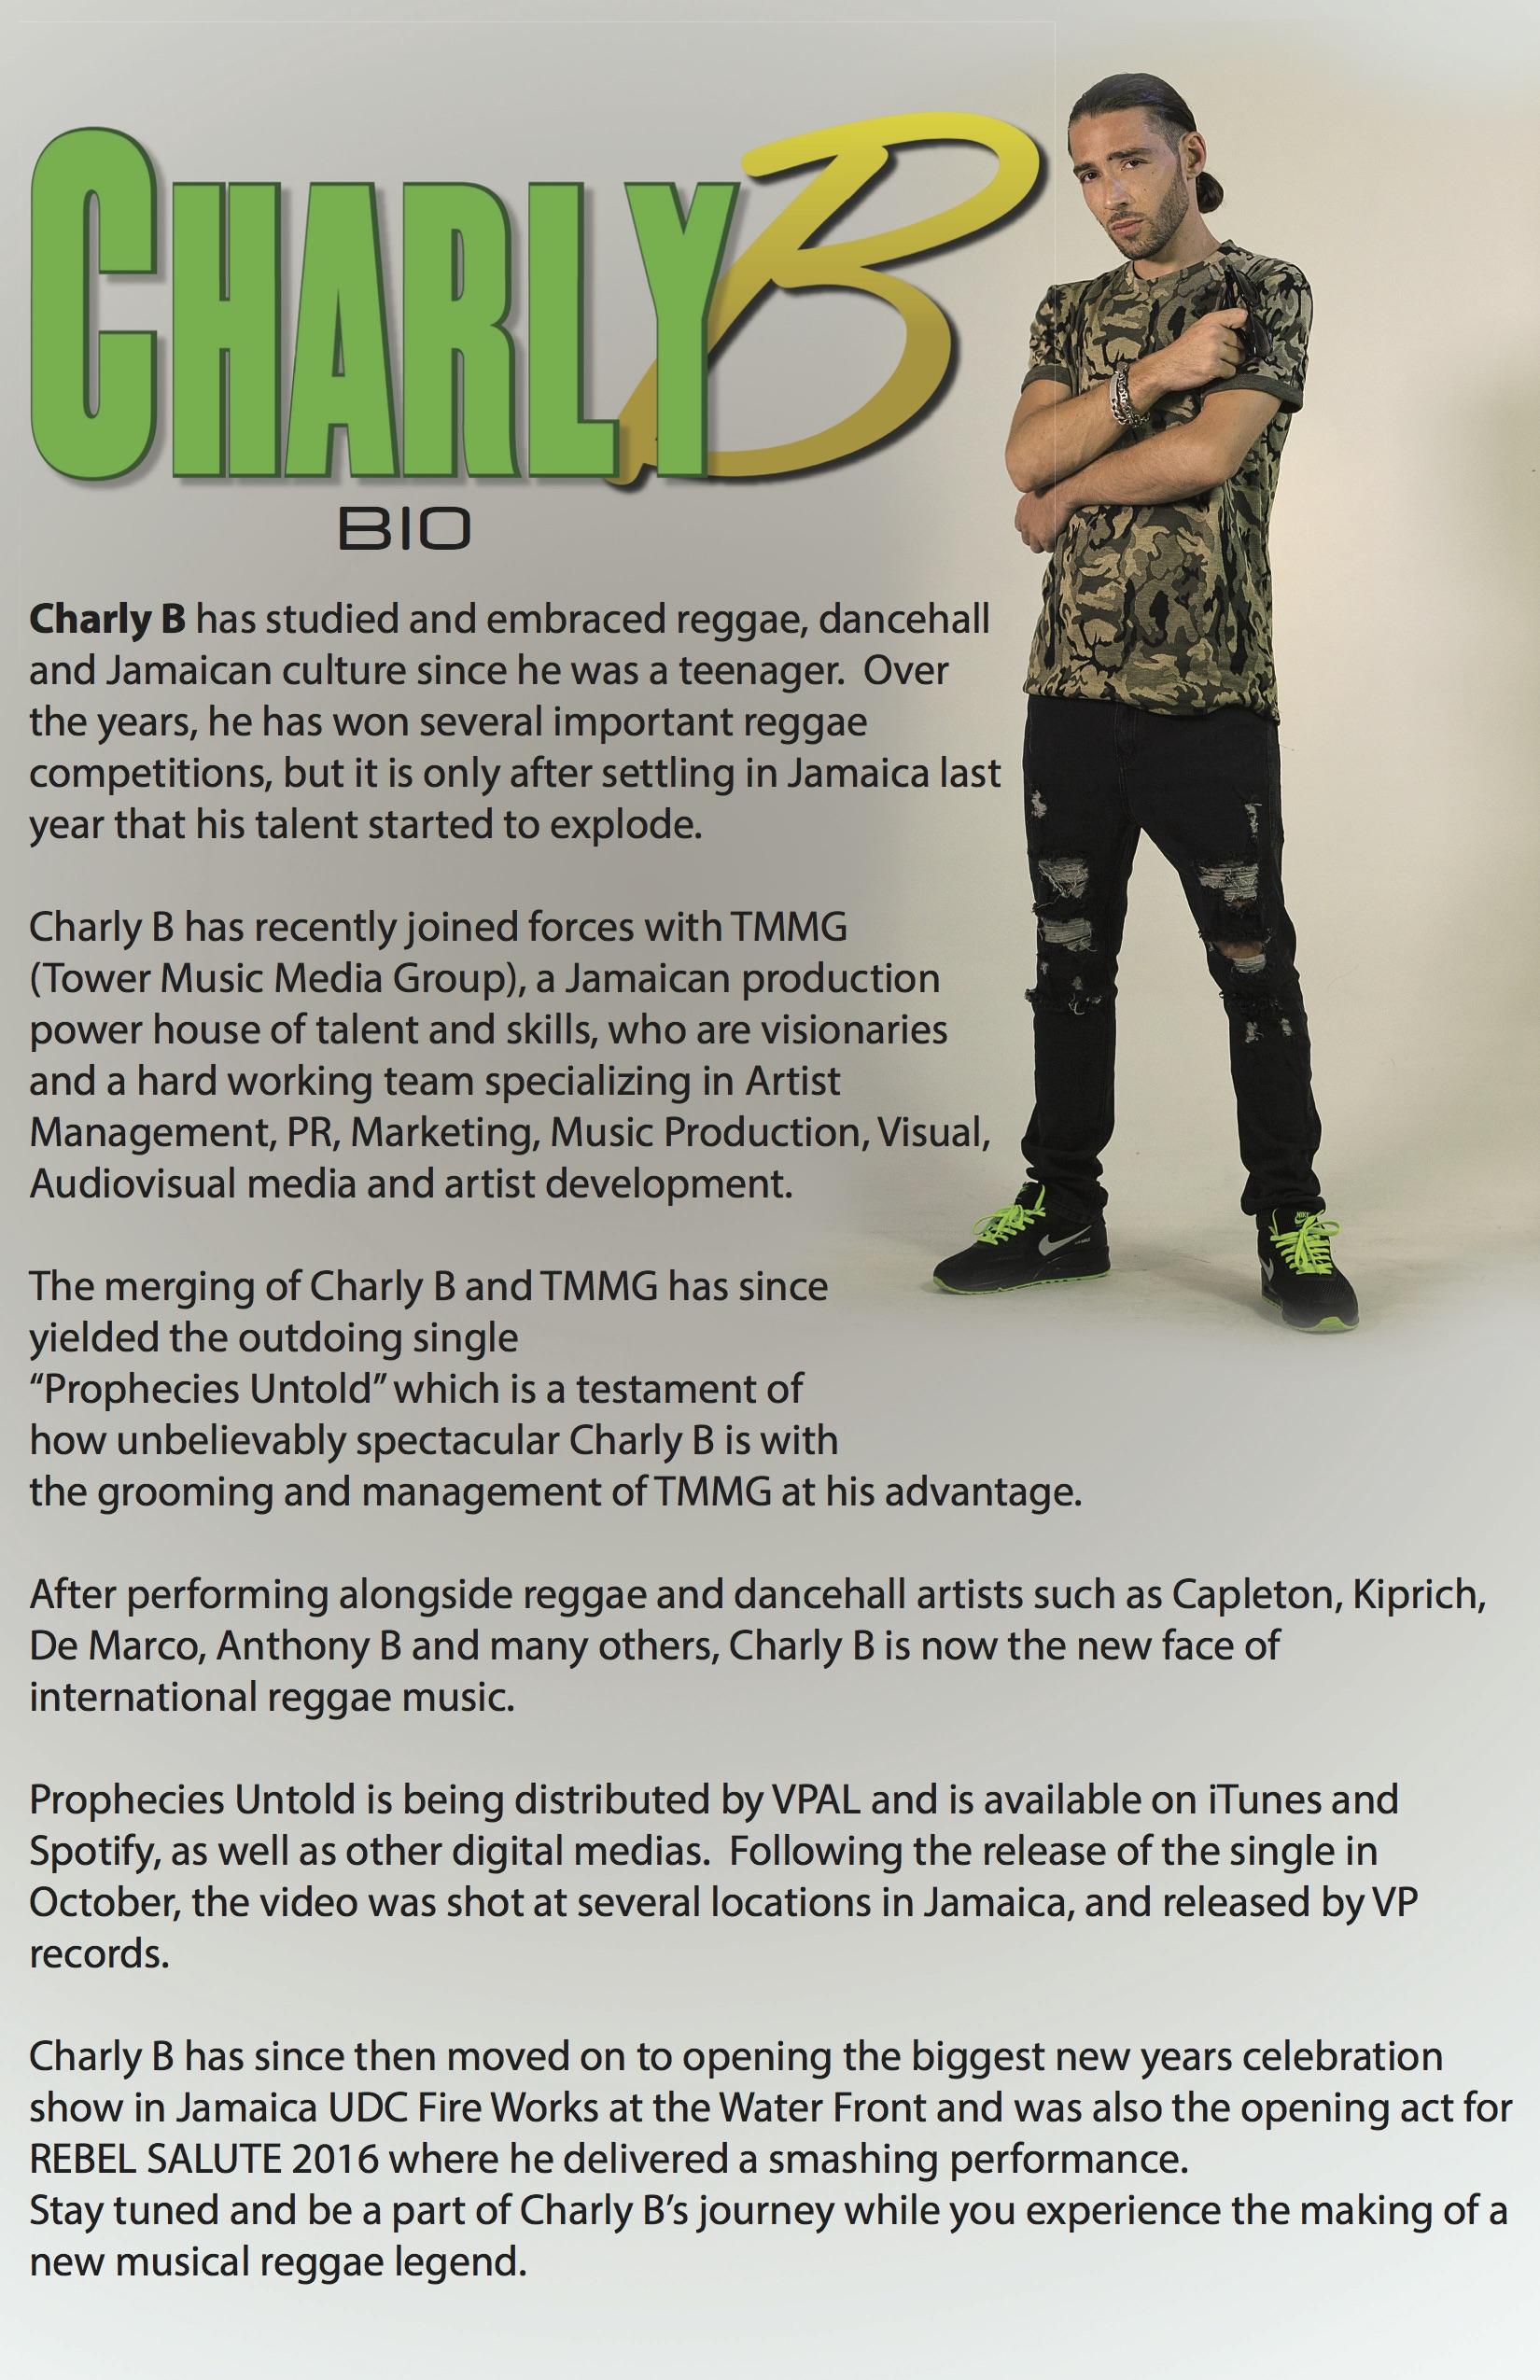 Charly b Biography